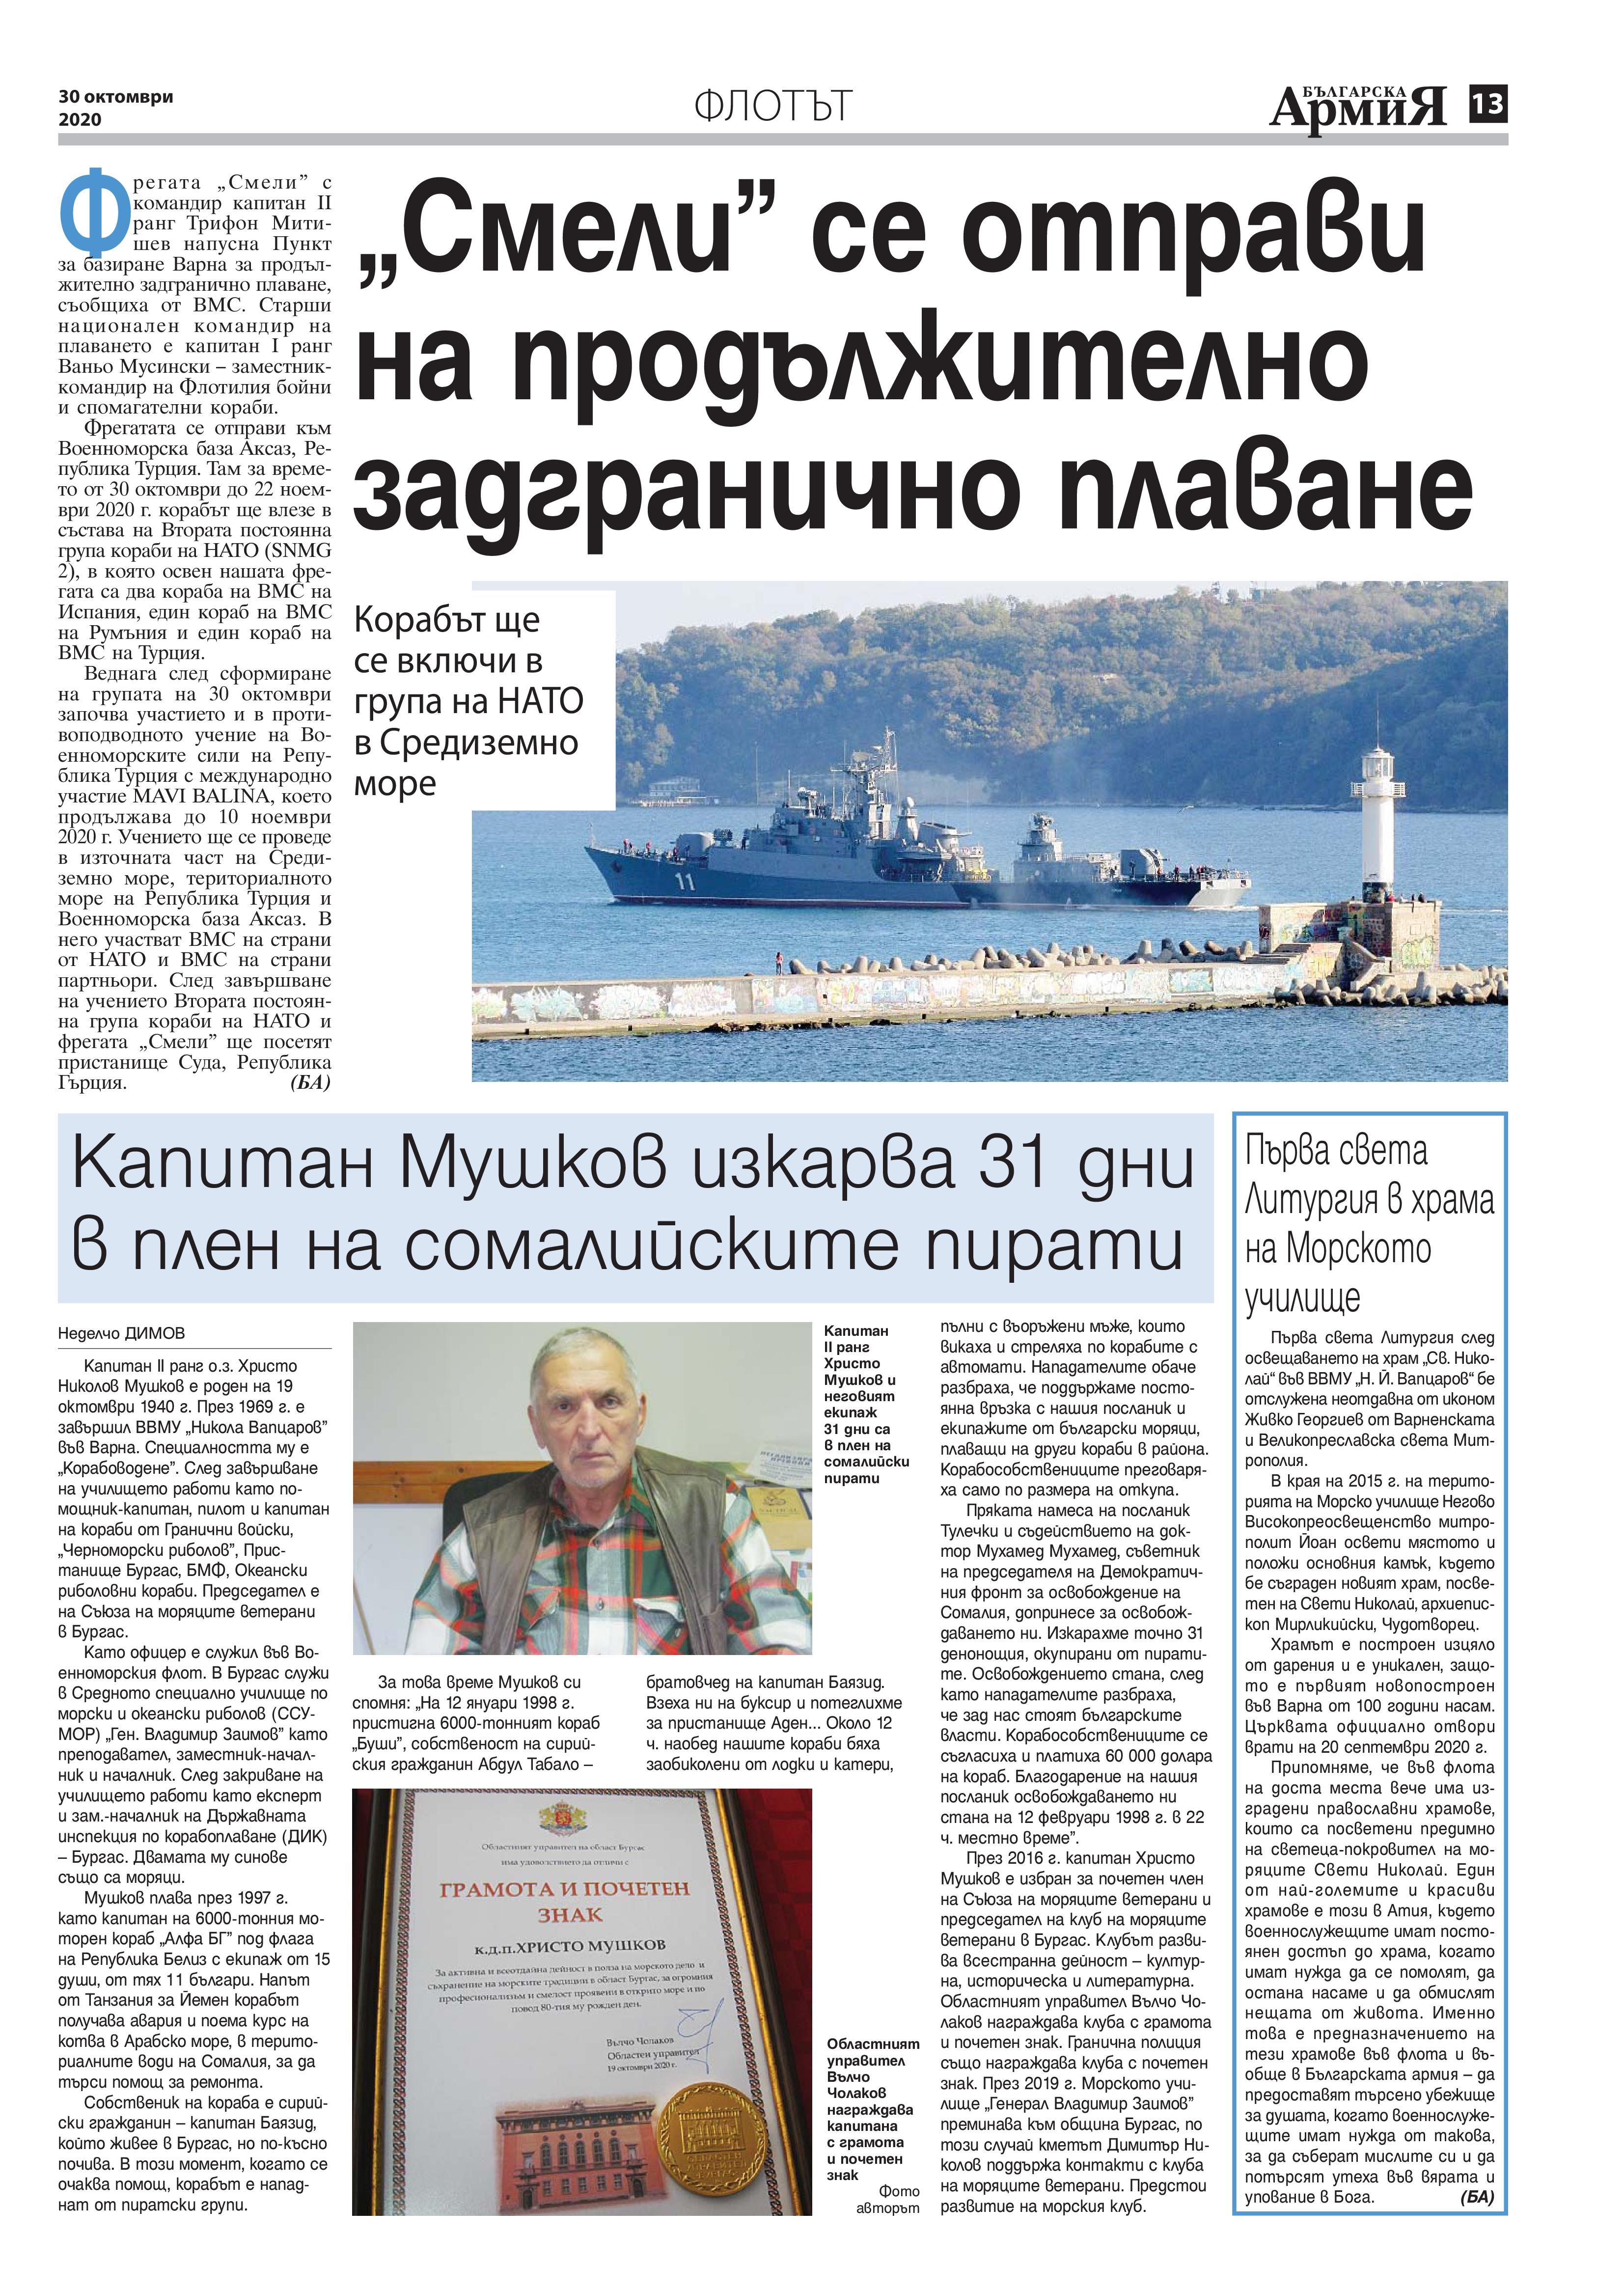 https://armymedia.bg/wp-content/uploads/2015/06/13-46.jpg